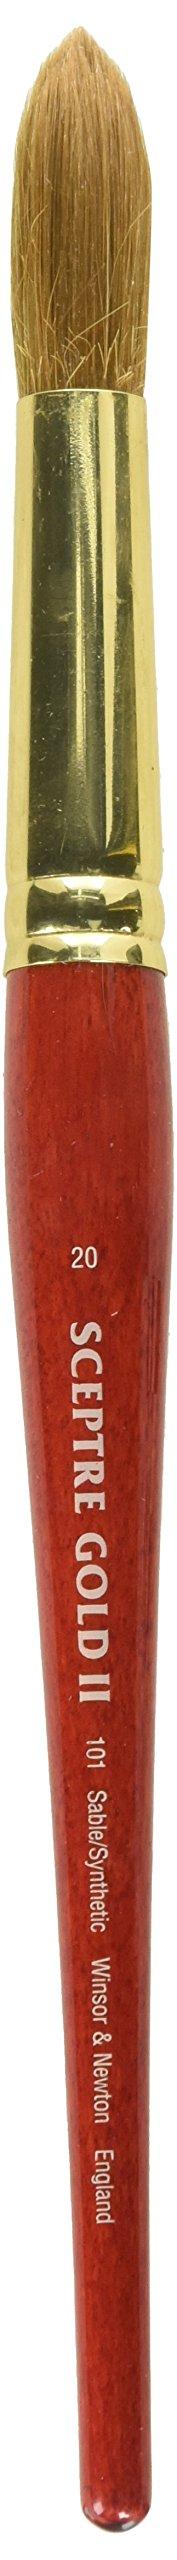 Winsor & Newton Sceptre Gold II Series 101 Short Handle Brush-Round #20